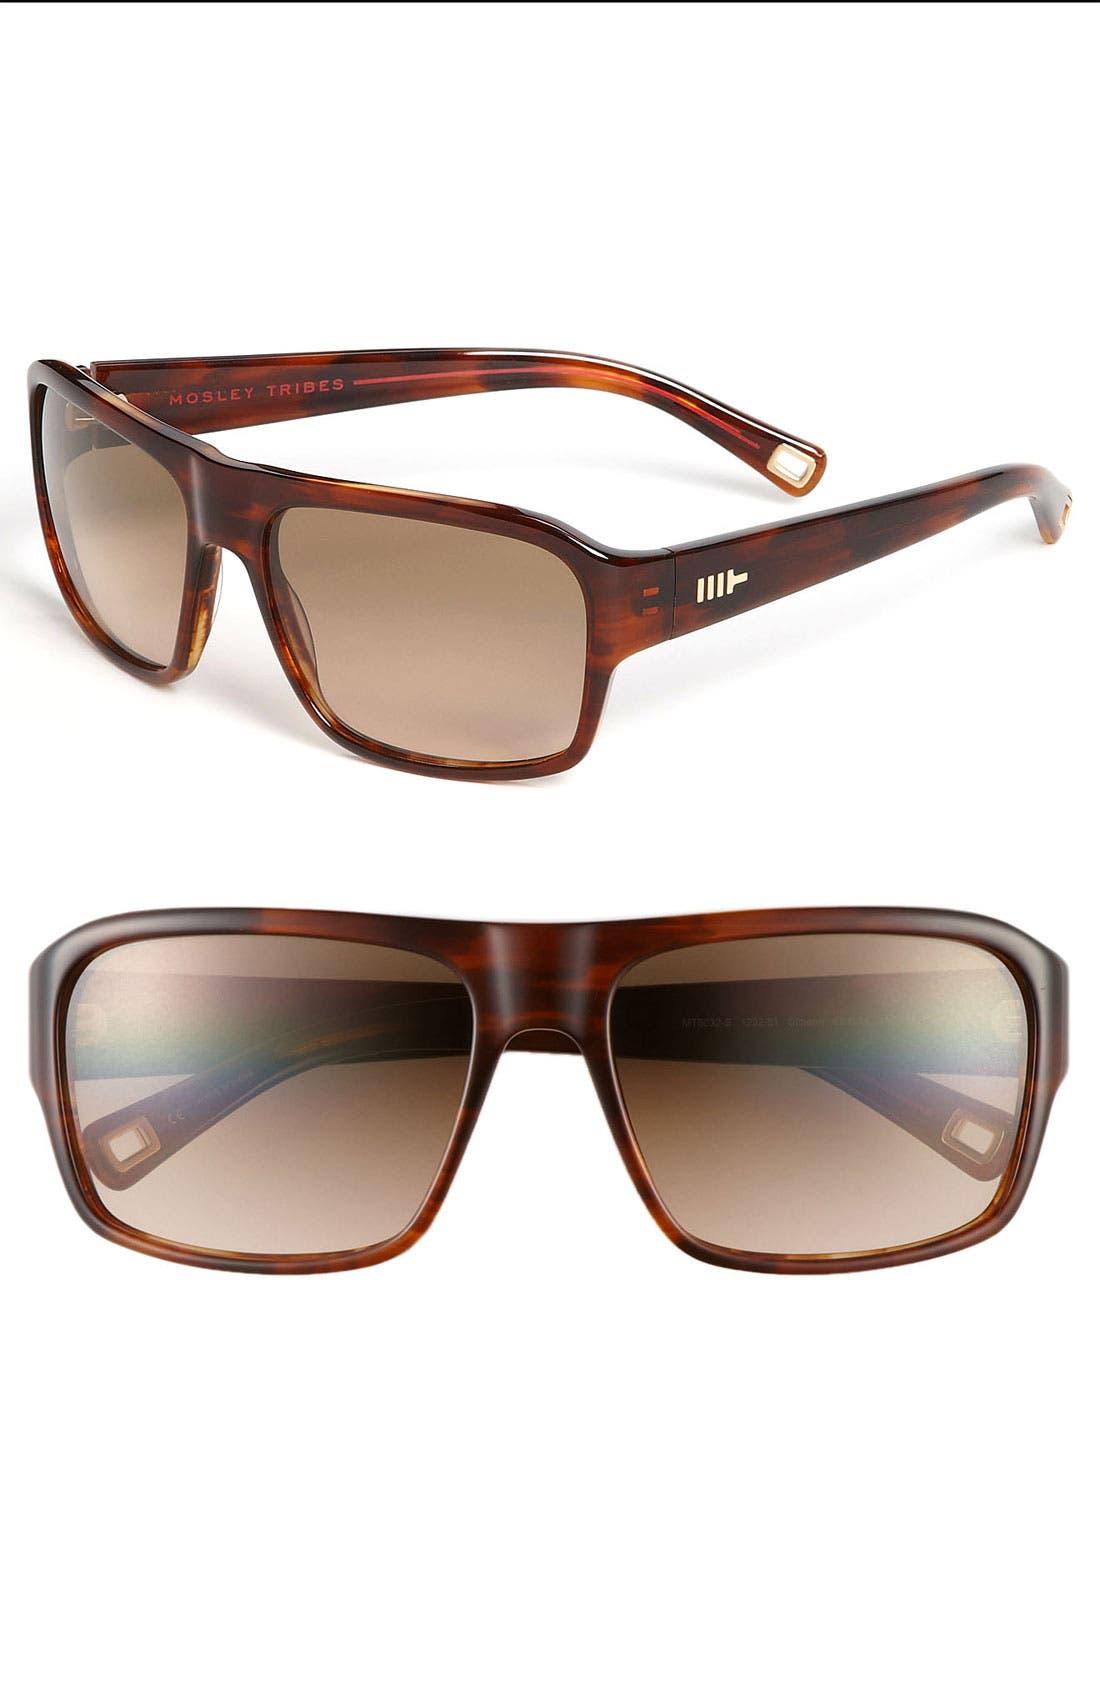 Main Image - Mosley Tribes 'Simeon' Sunglasses